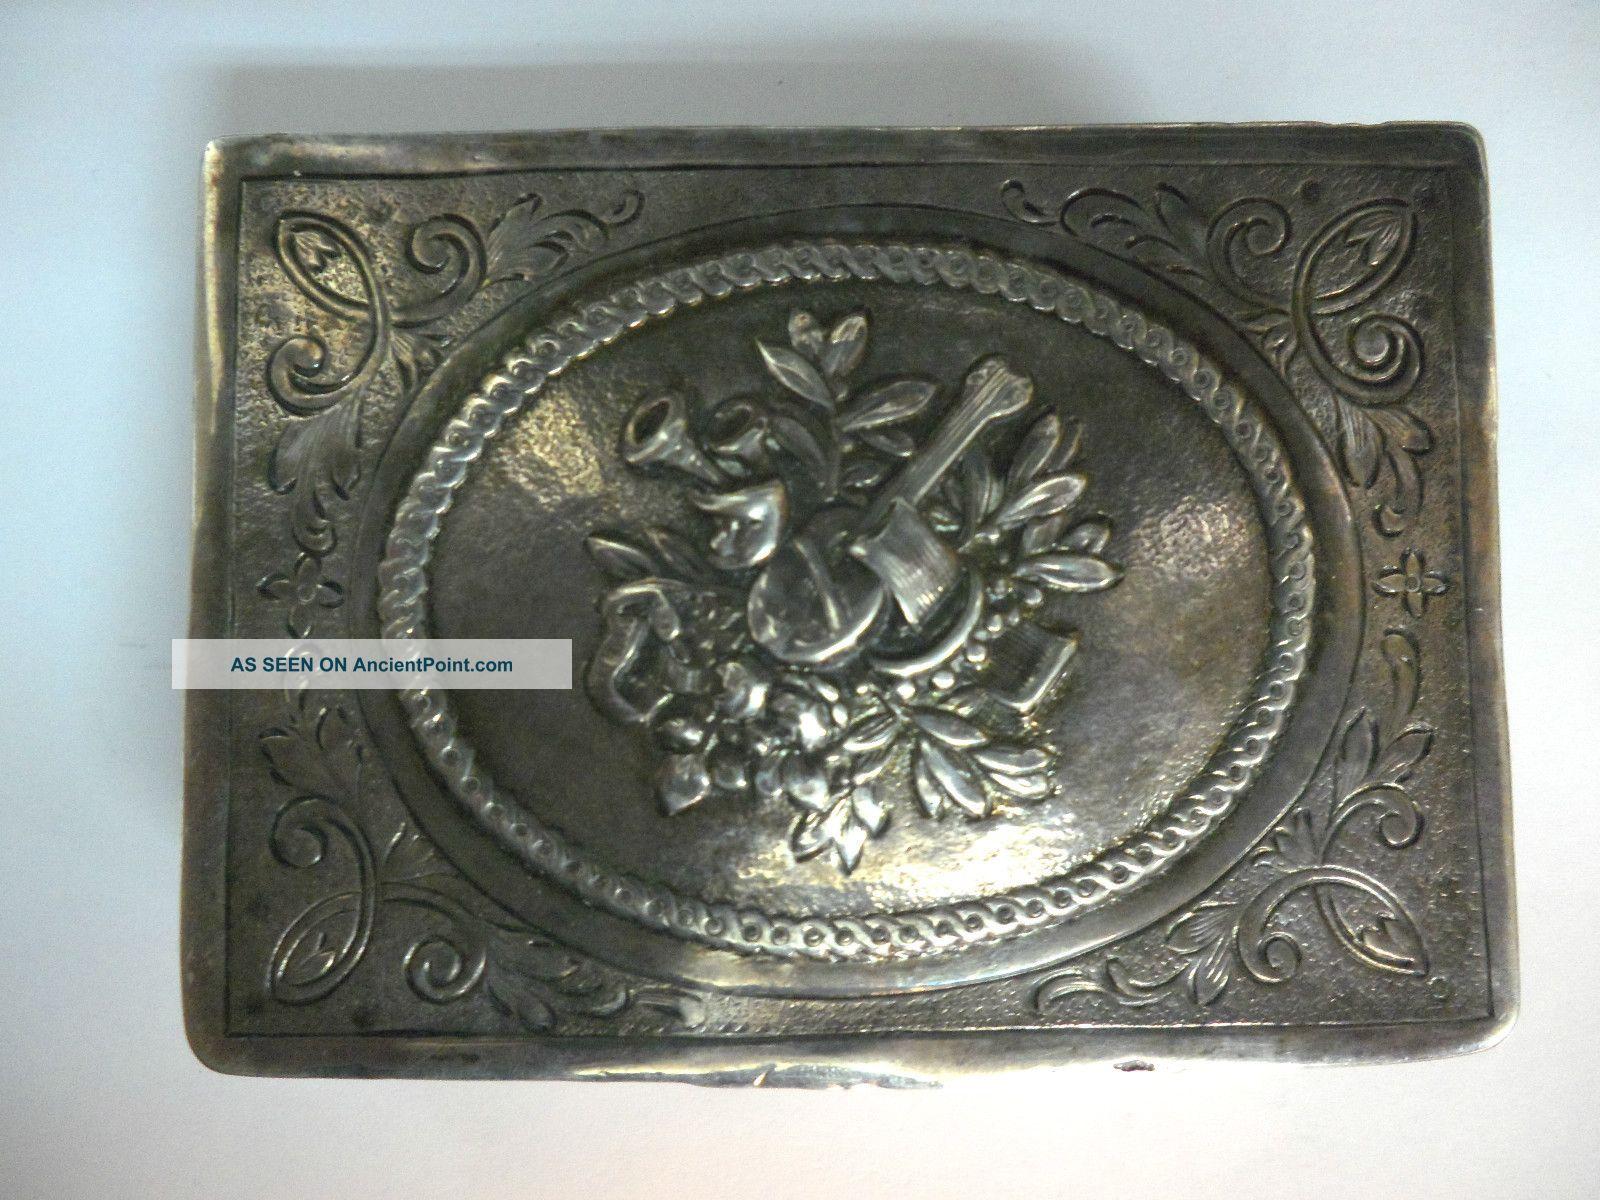 Antique Silver Snuff Box Tobacco Case Germany Hanau Sweden Heavy 128 Grams Silver Alloys (.800-.899) photo